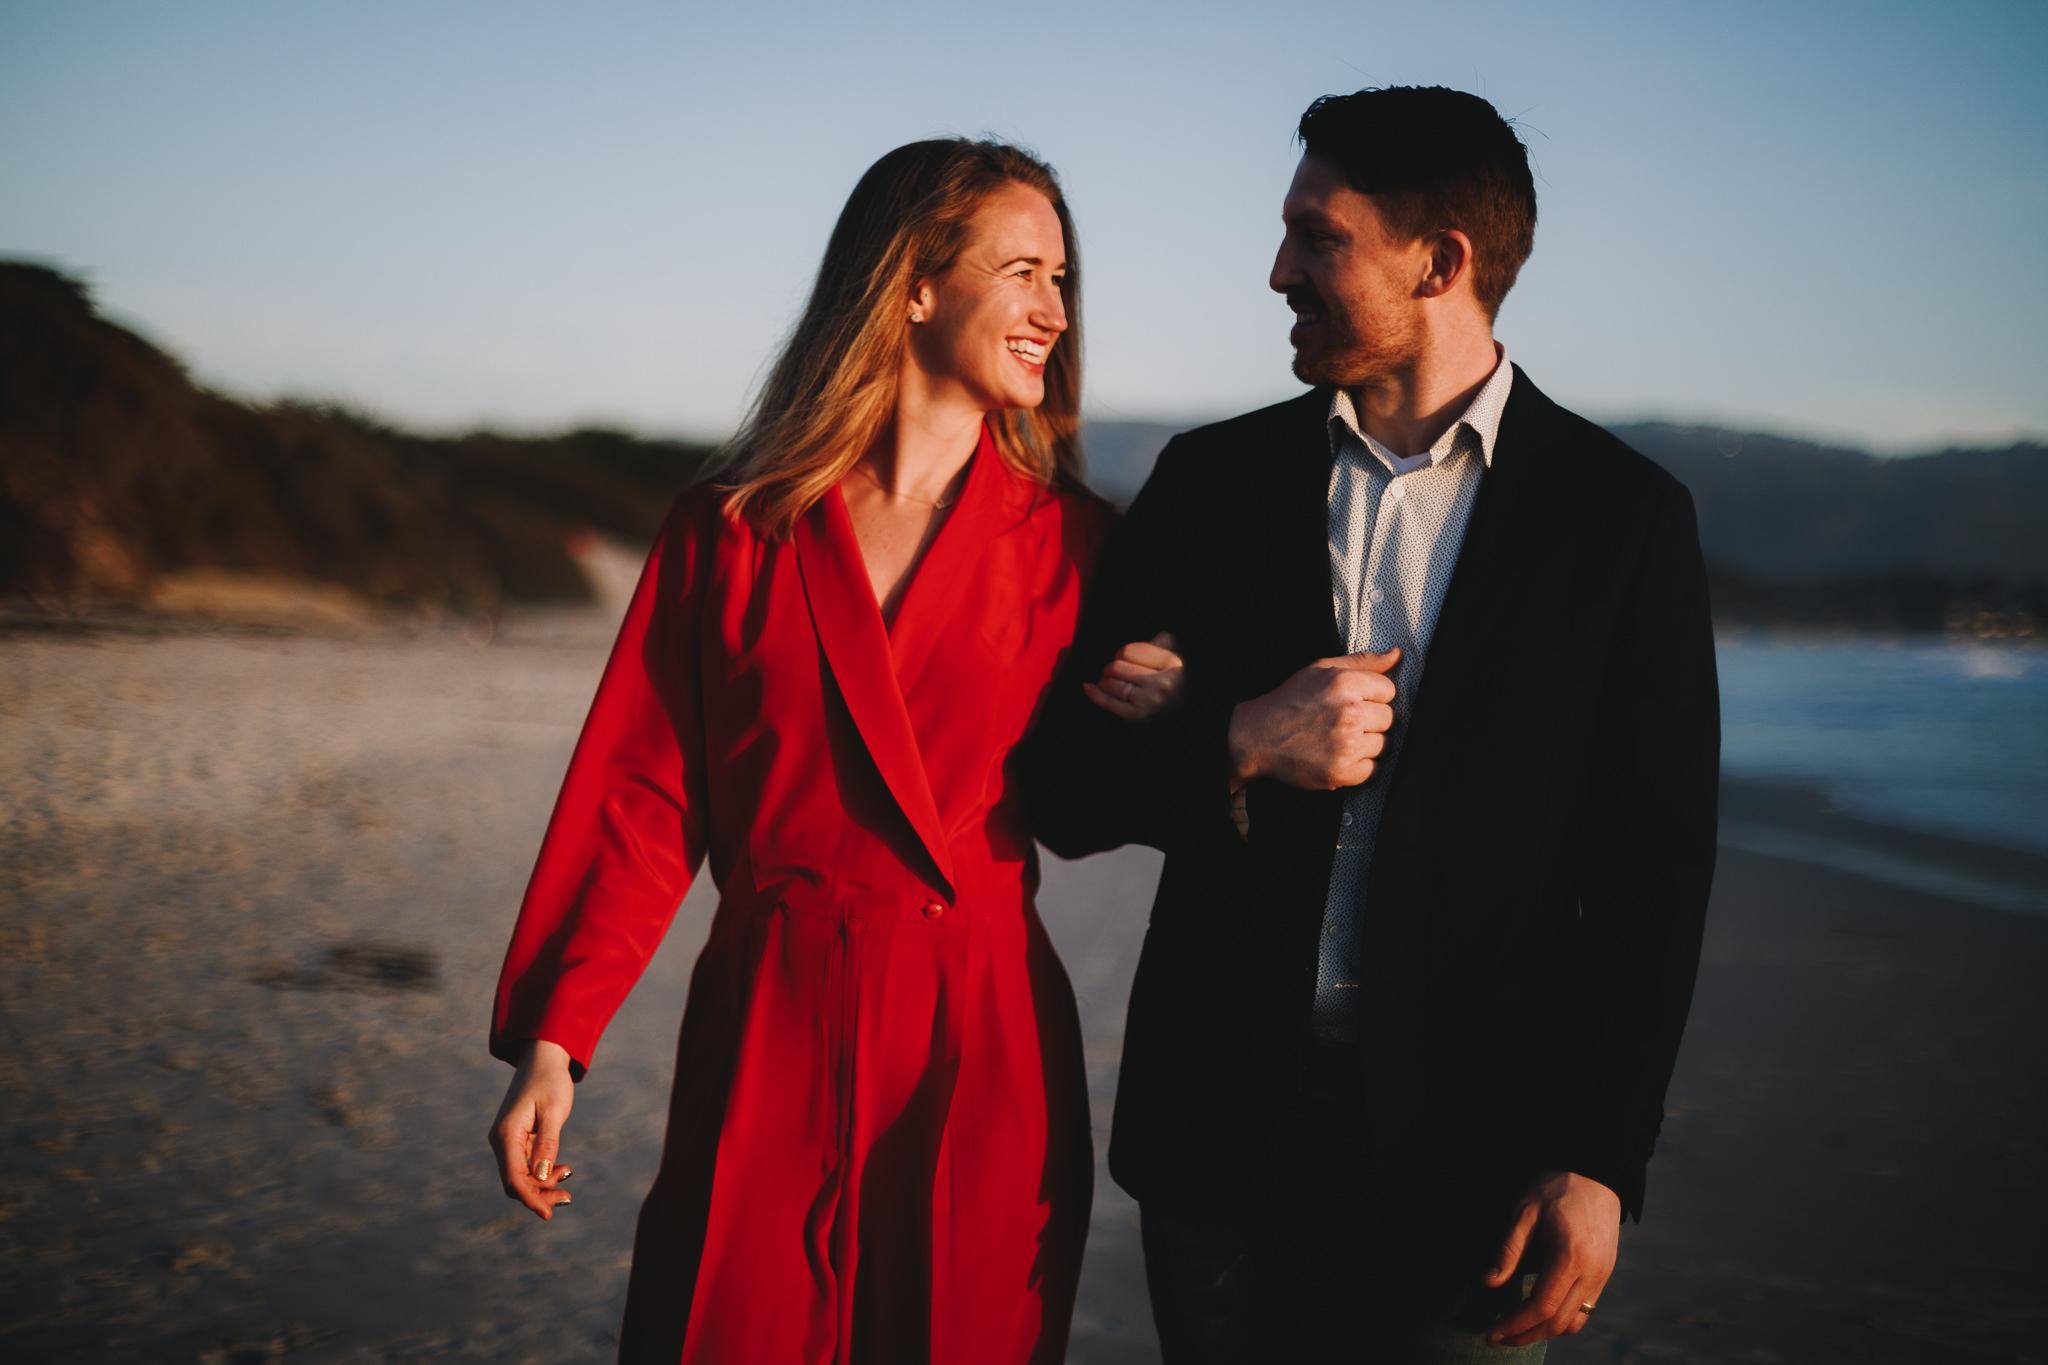 Archer Inspired Photography Carmel Beach California Wedding Engagement Lifestyle Anniversary Natural Light Photographer-41.jpg